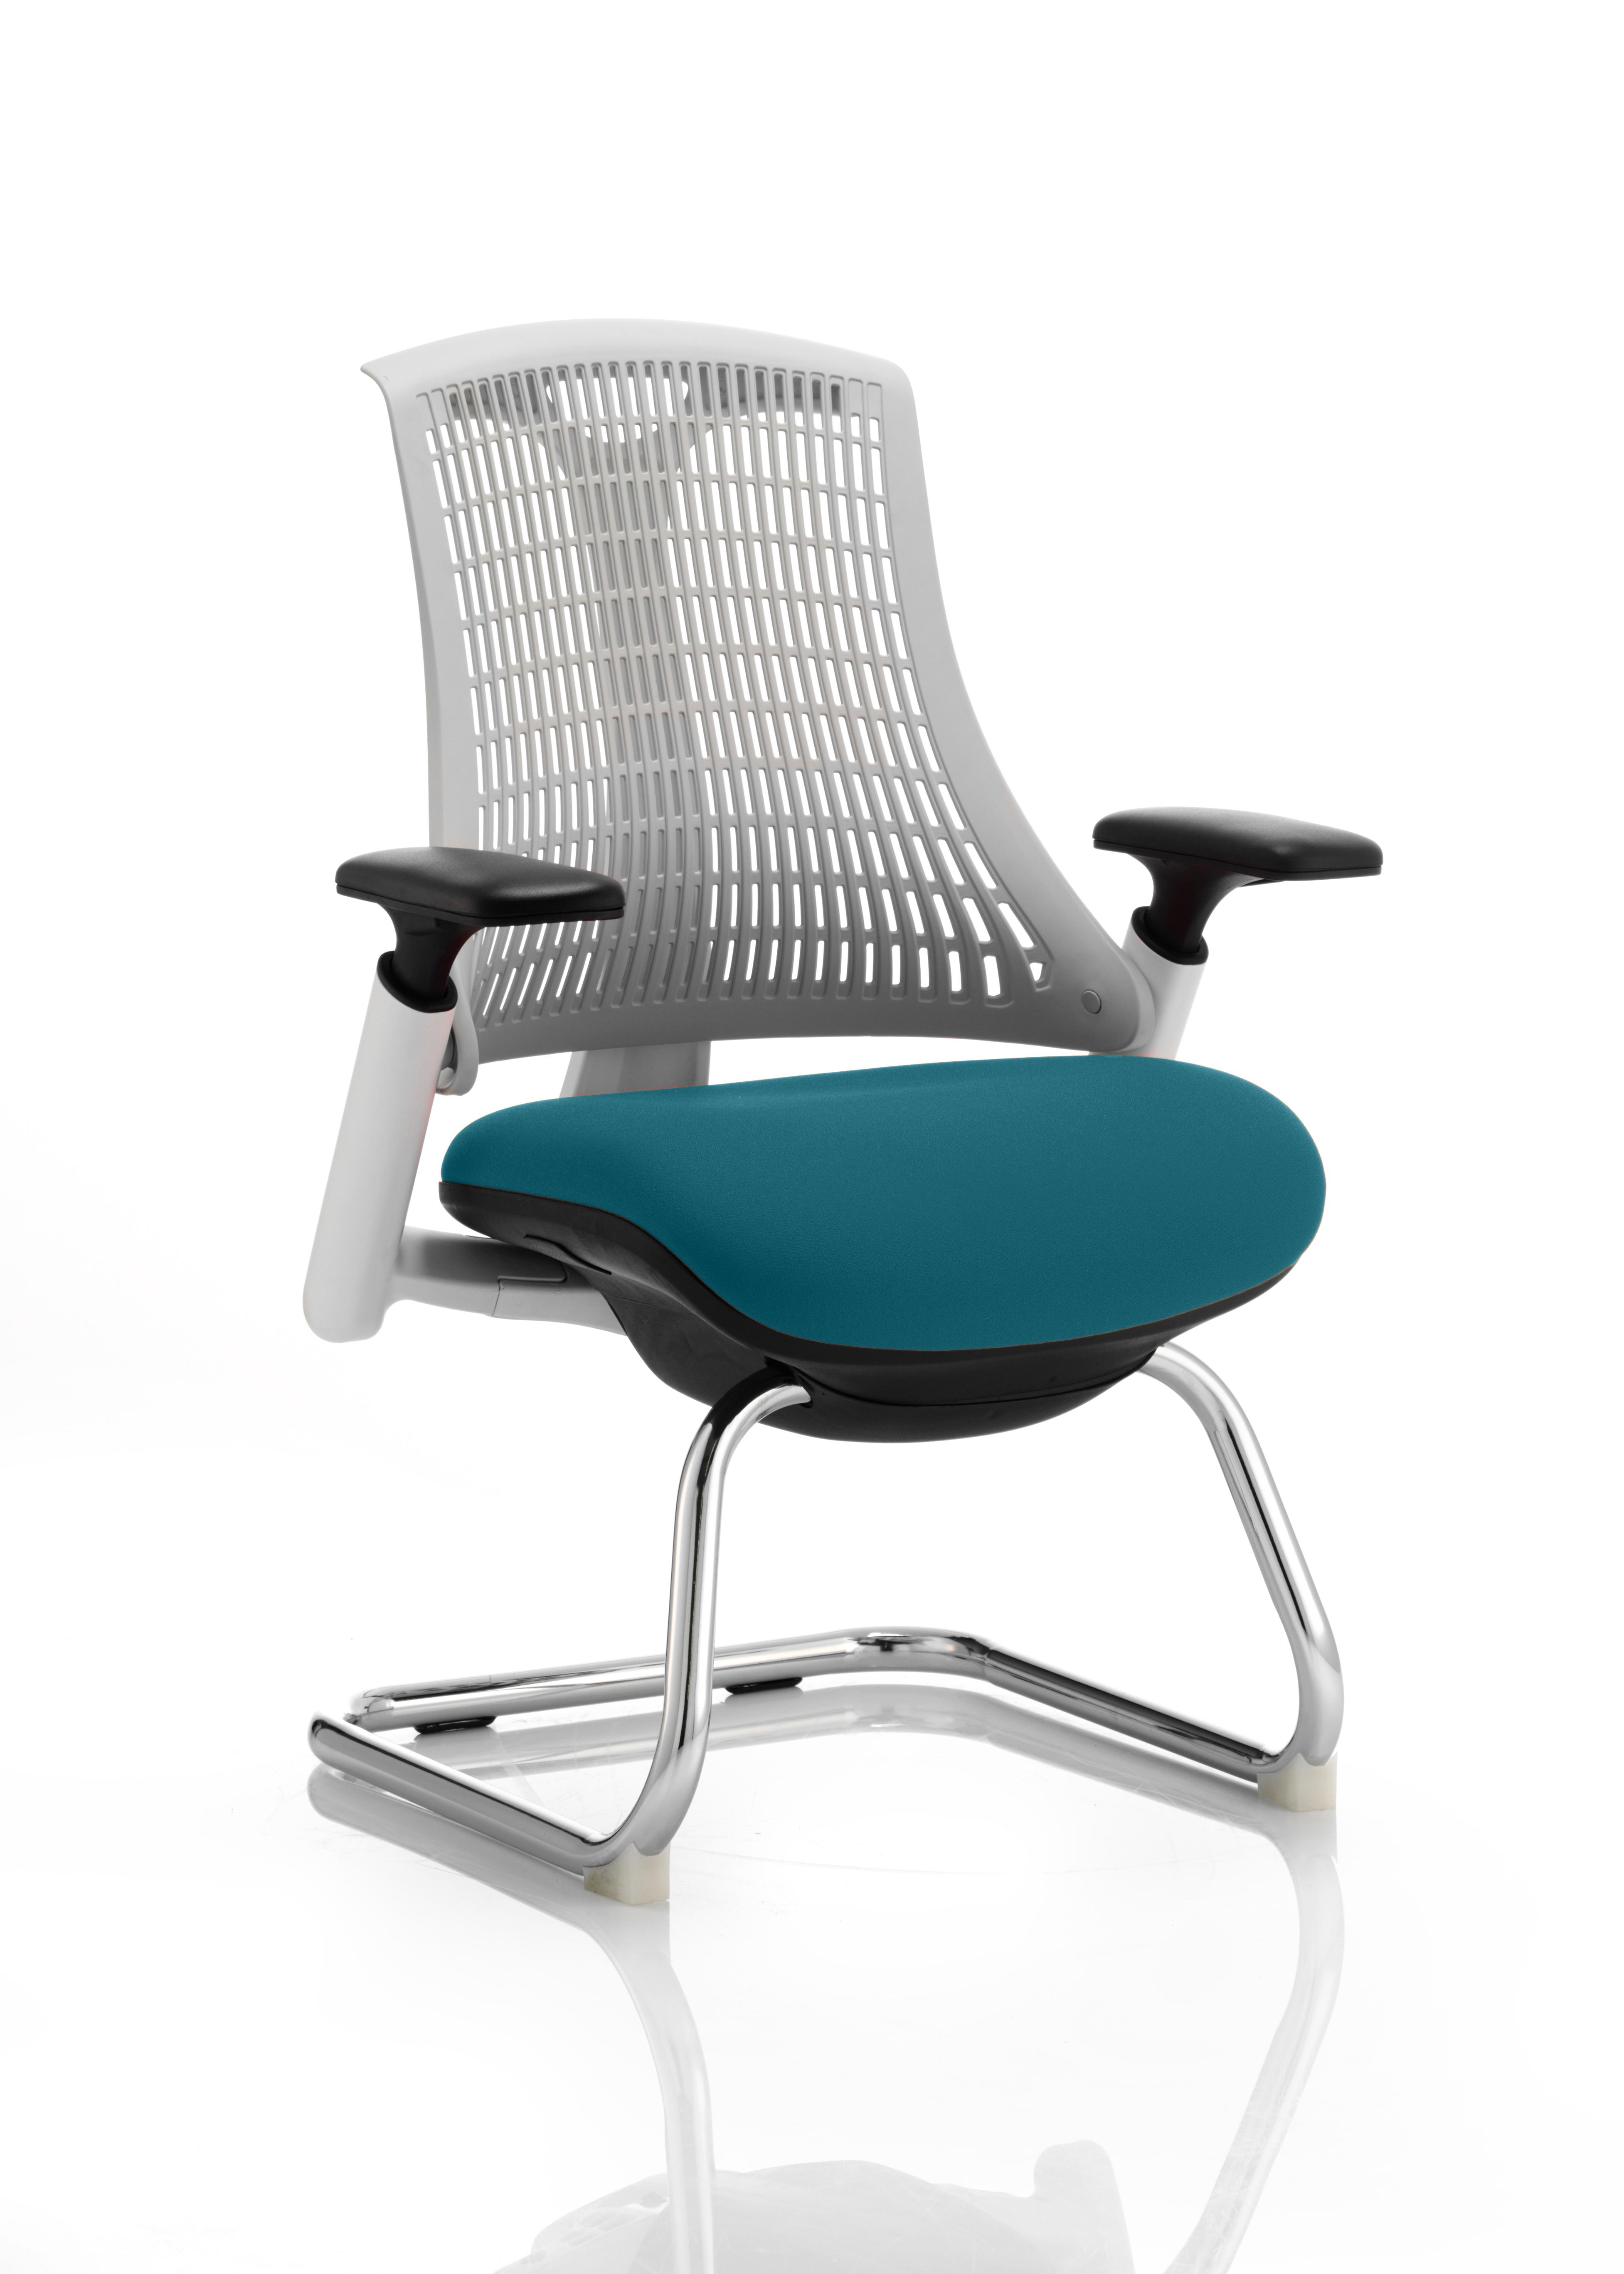 Flex Cantilever Chair White Frame White Back Bespoke Colour Seat Maringa Teal